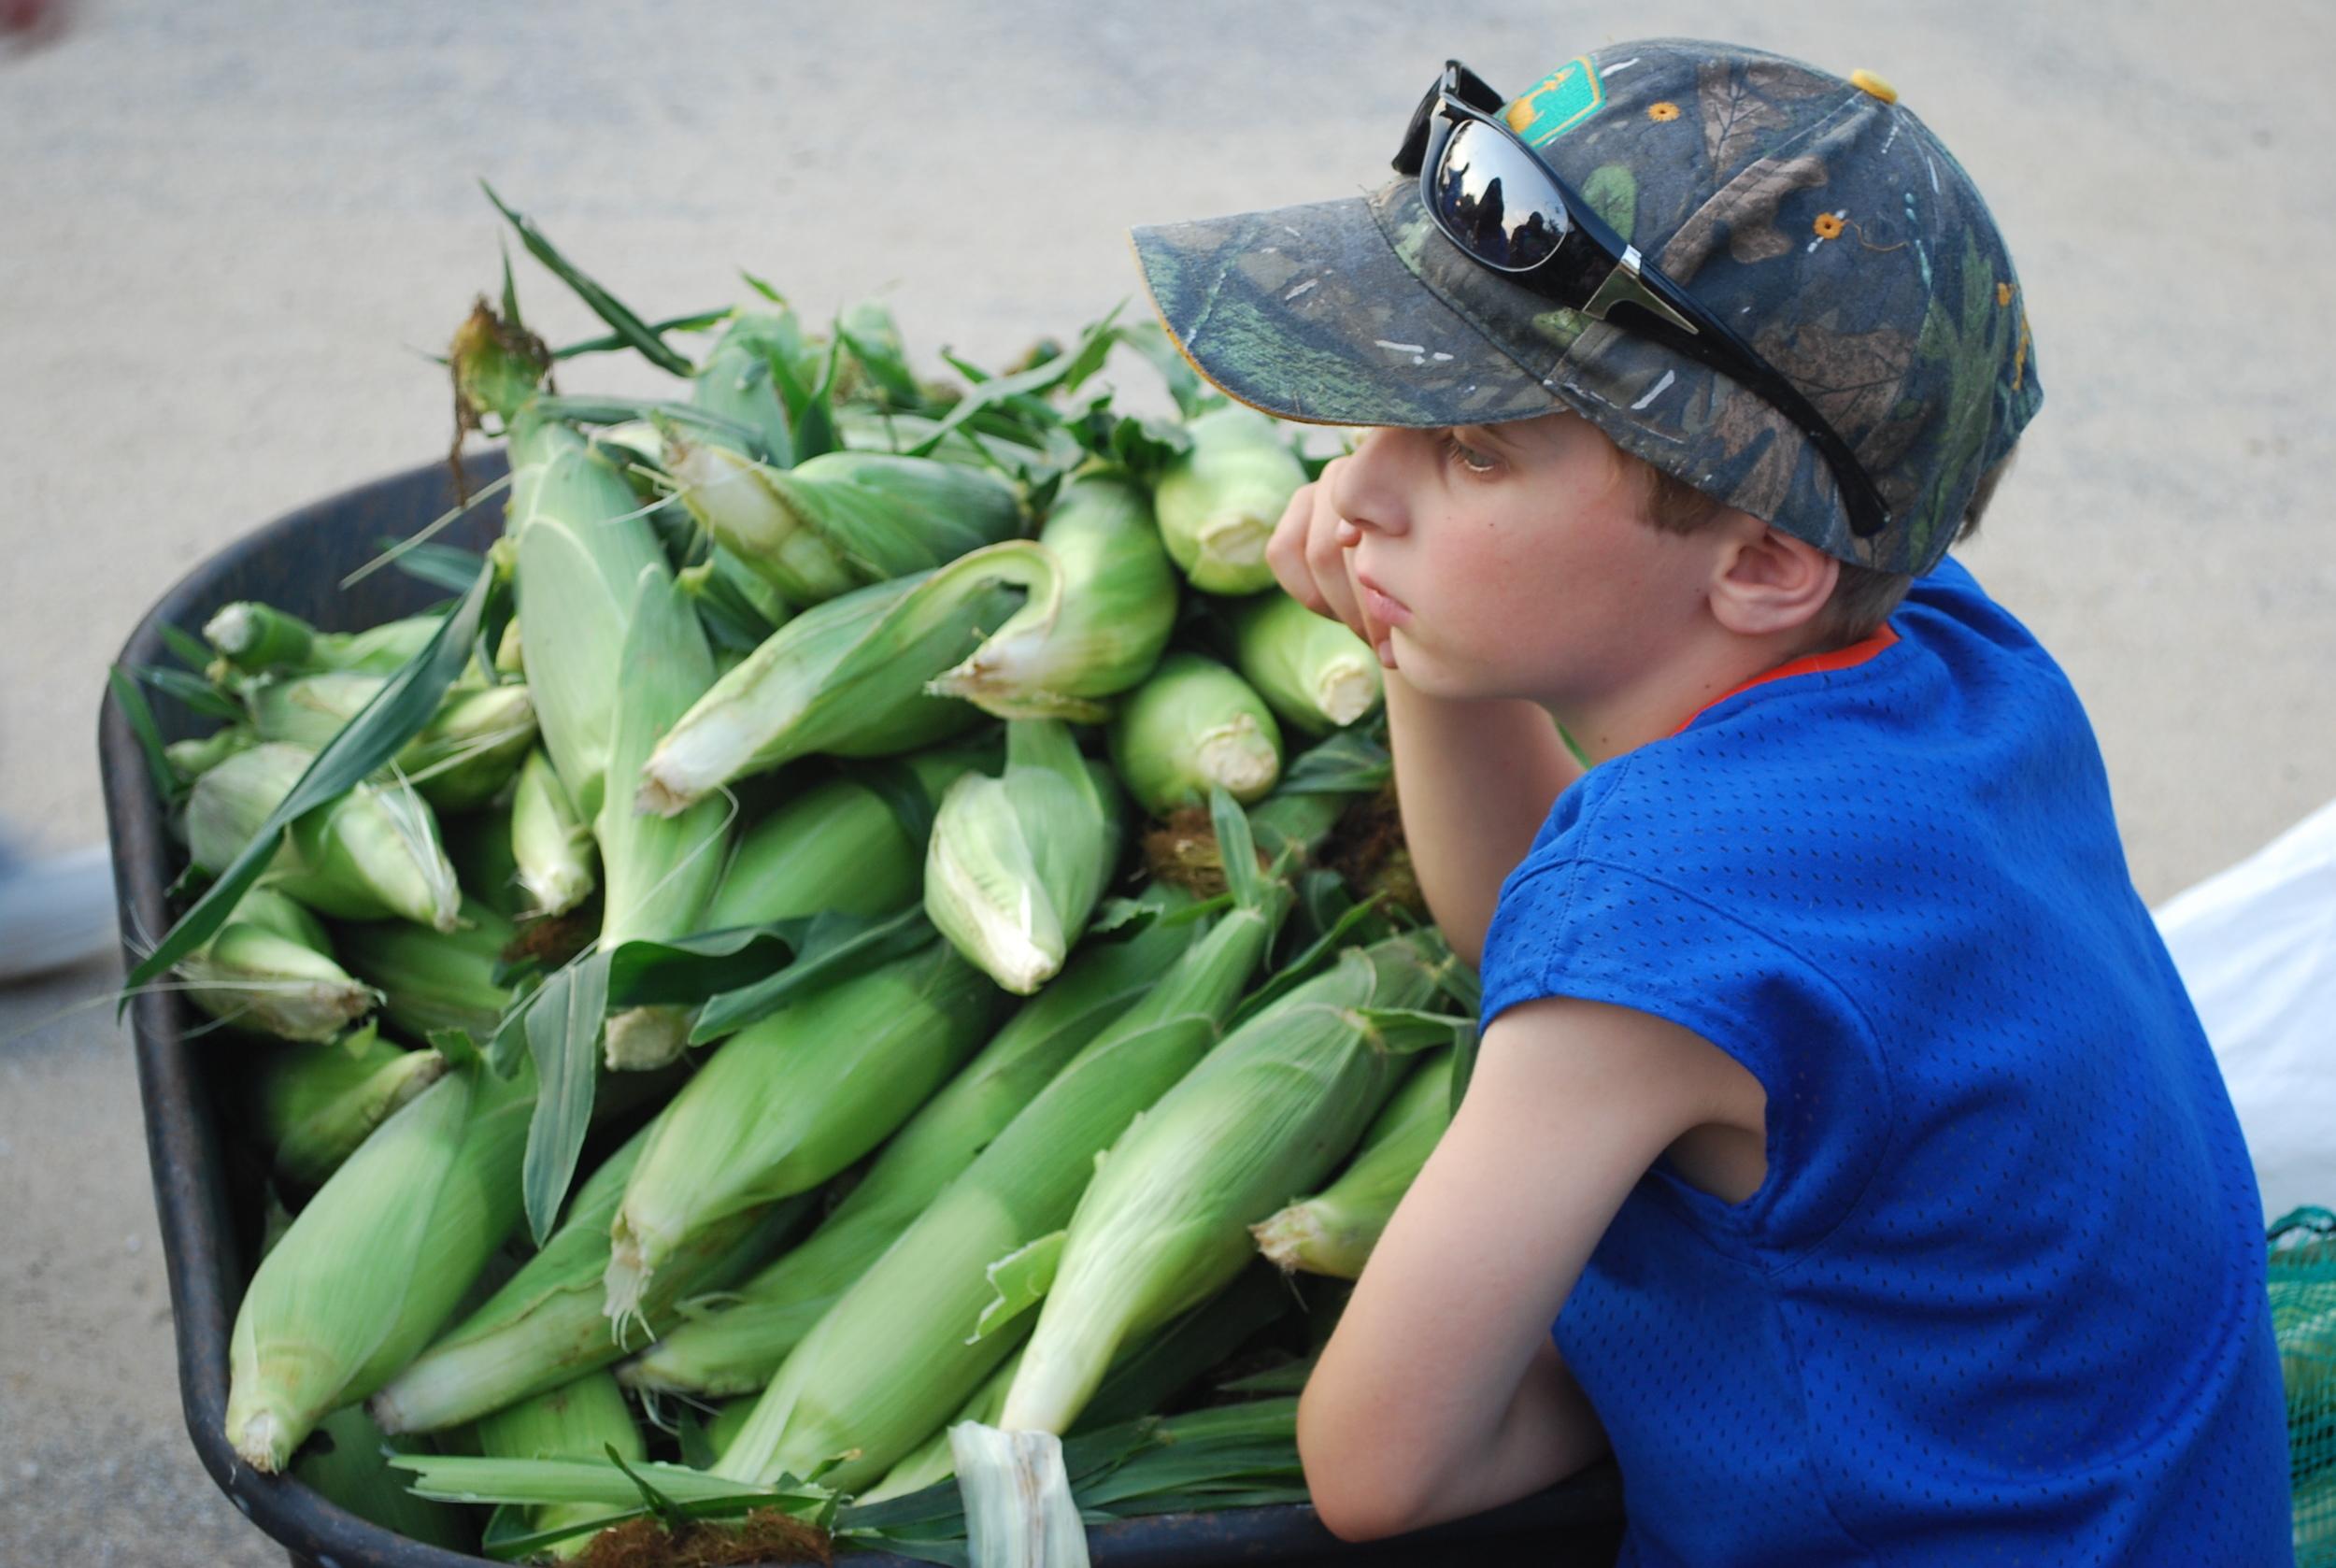 Piles of corn